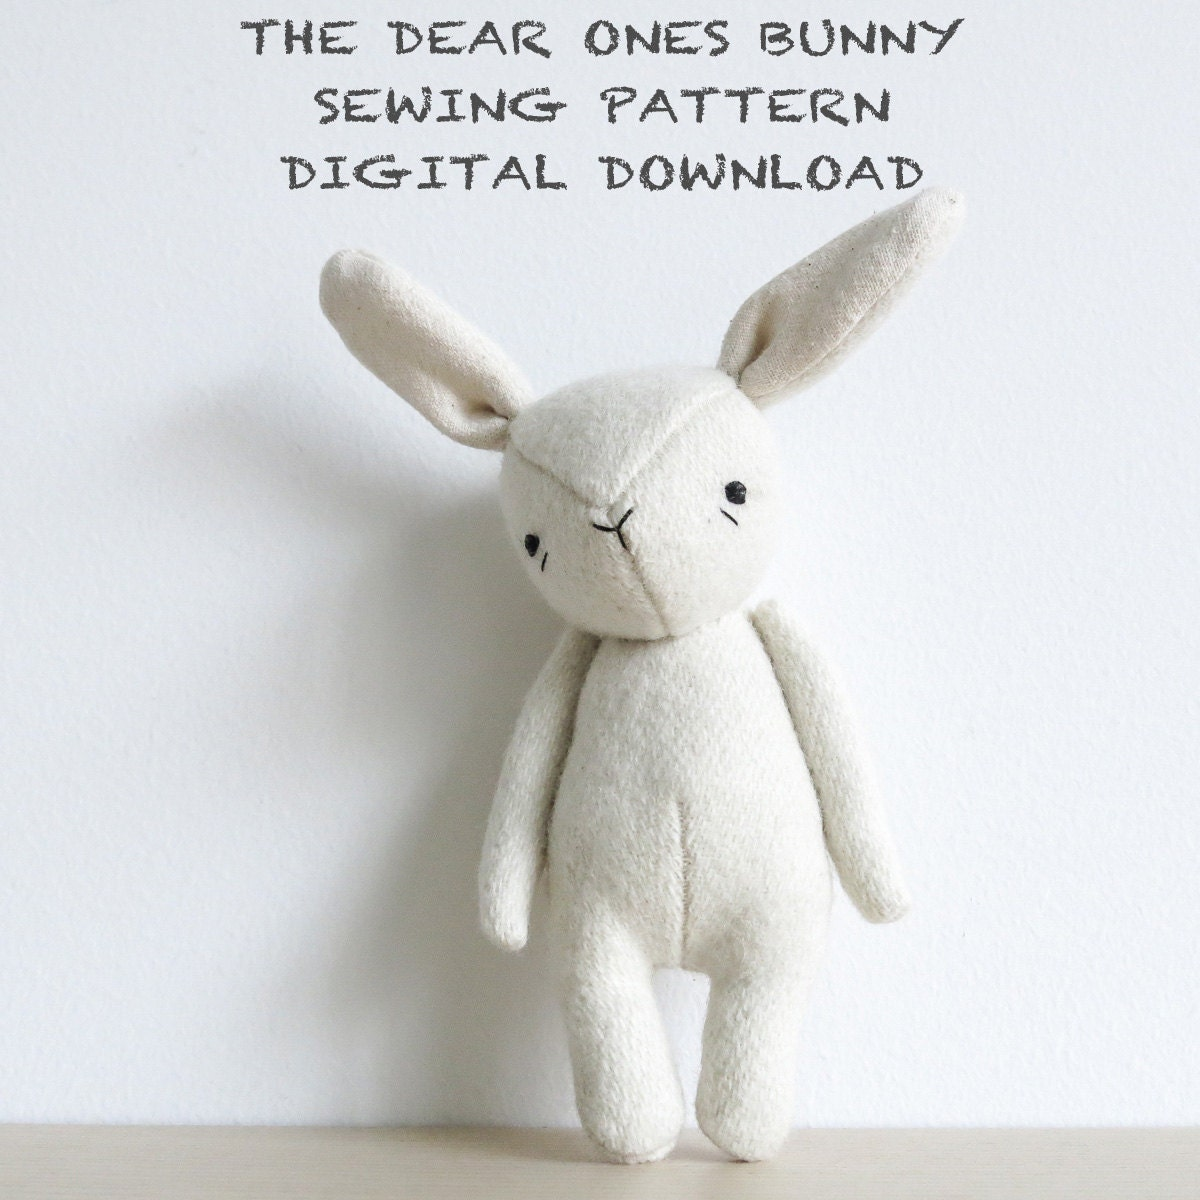 sewing pattern | the dear ones bunny | soft toy pdf pattern digital ...